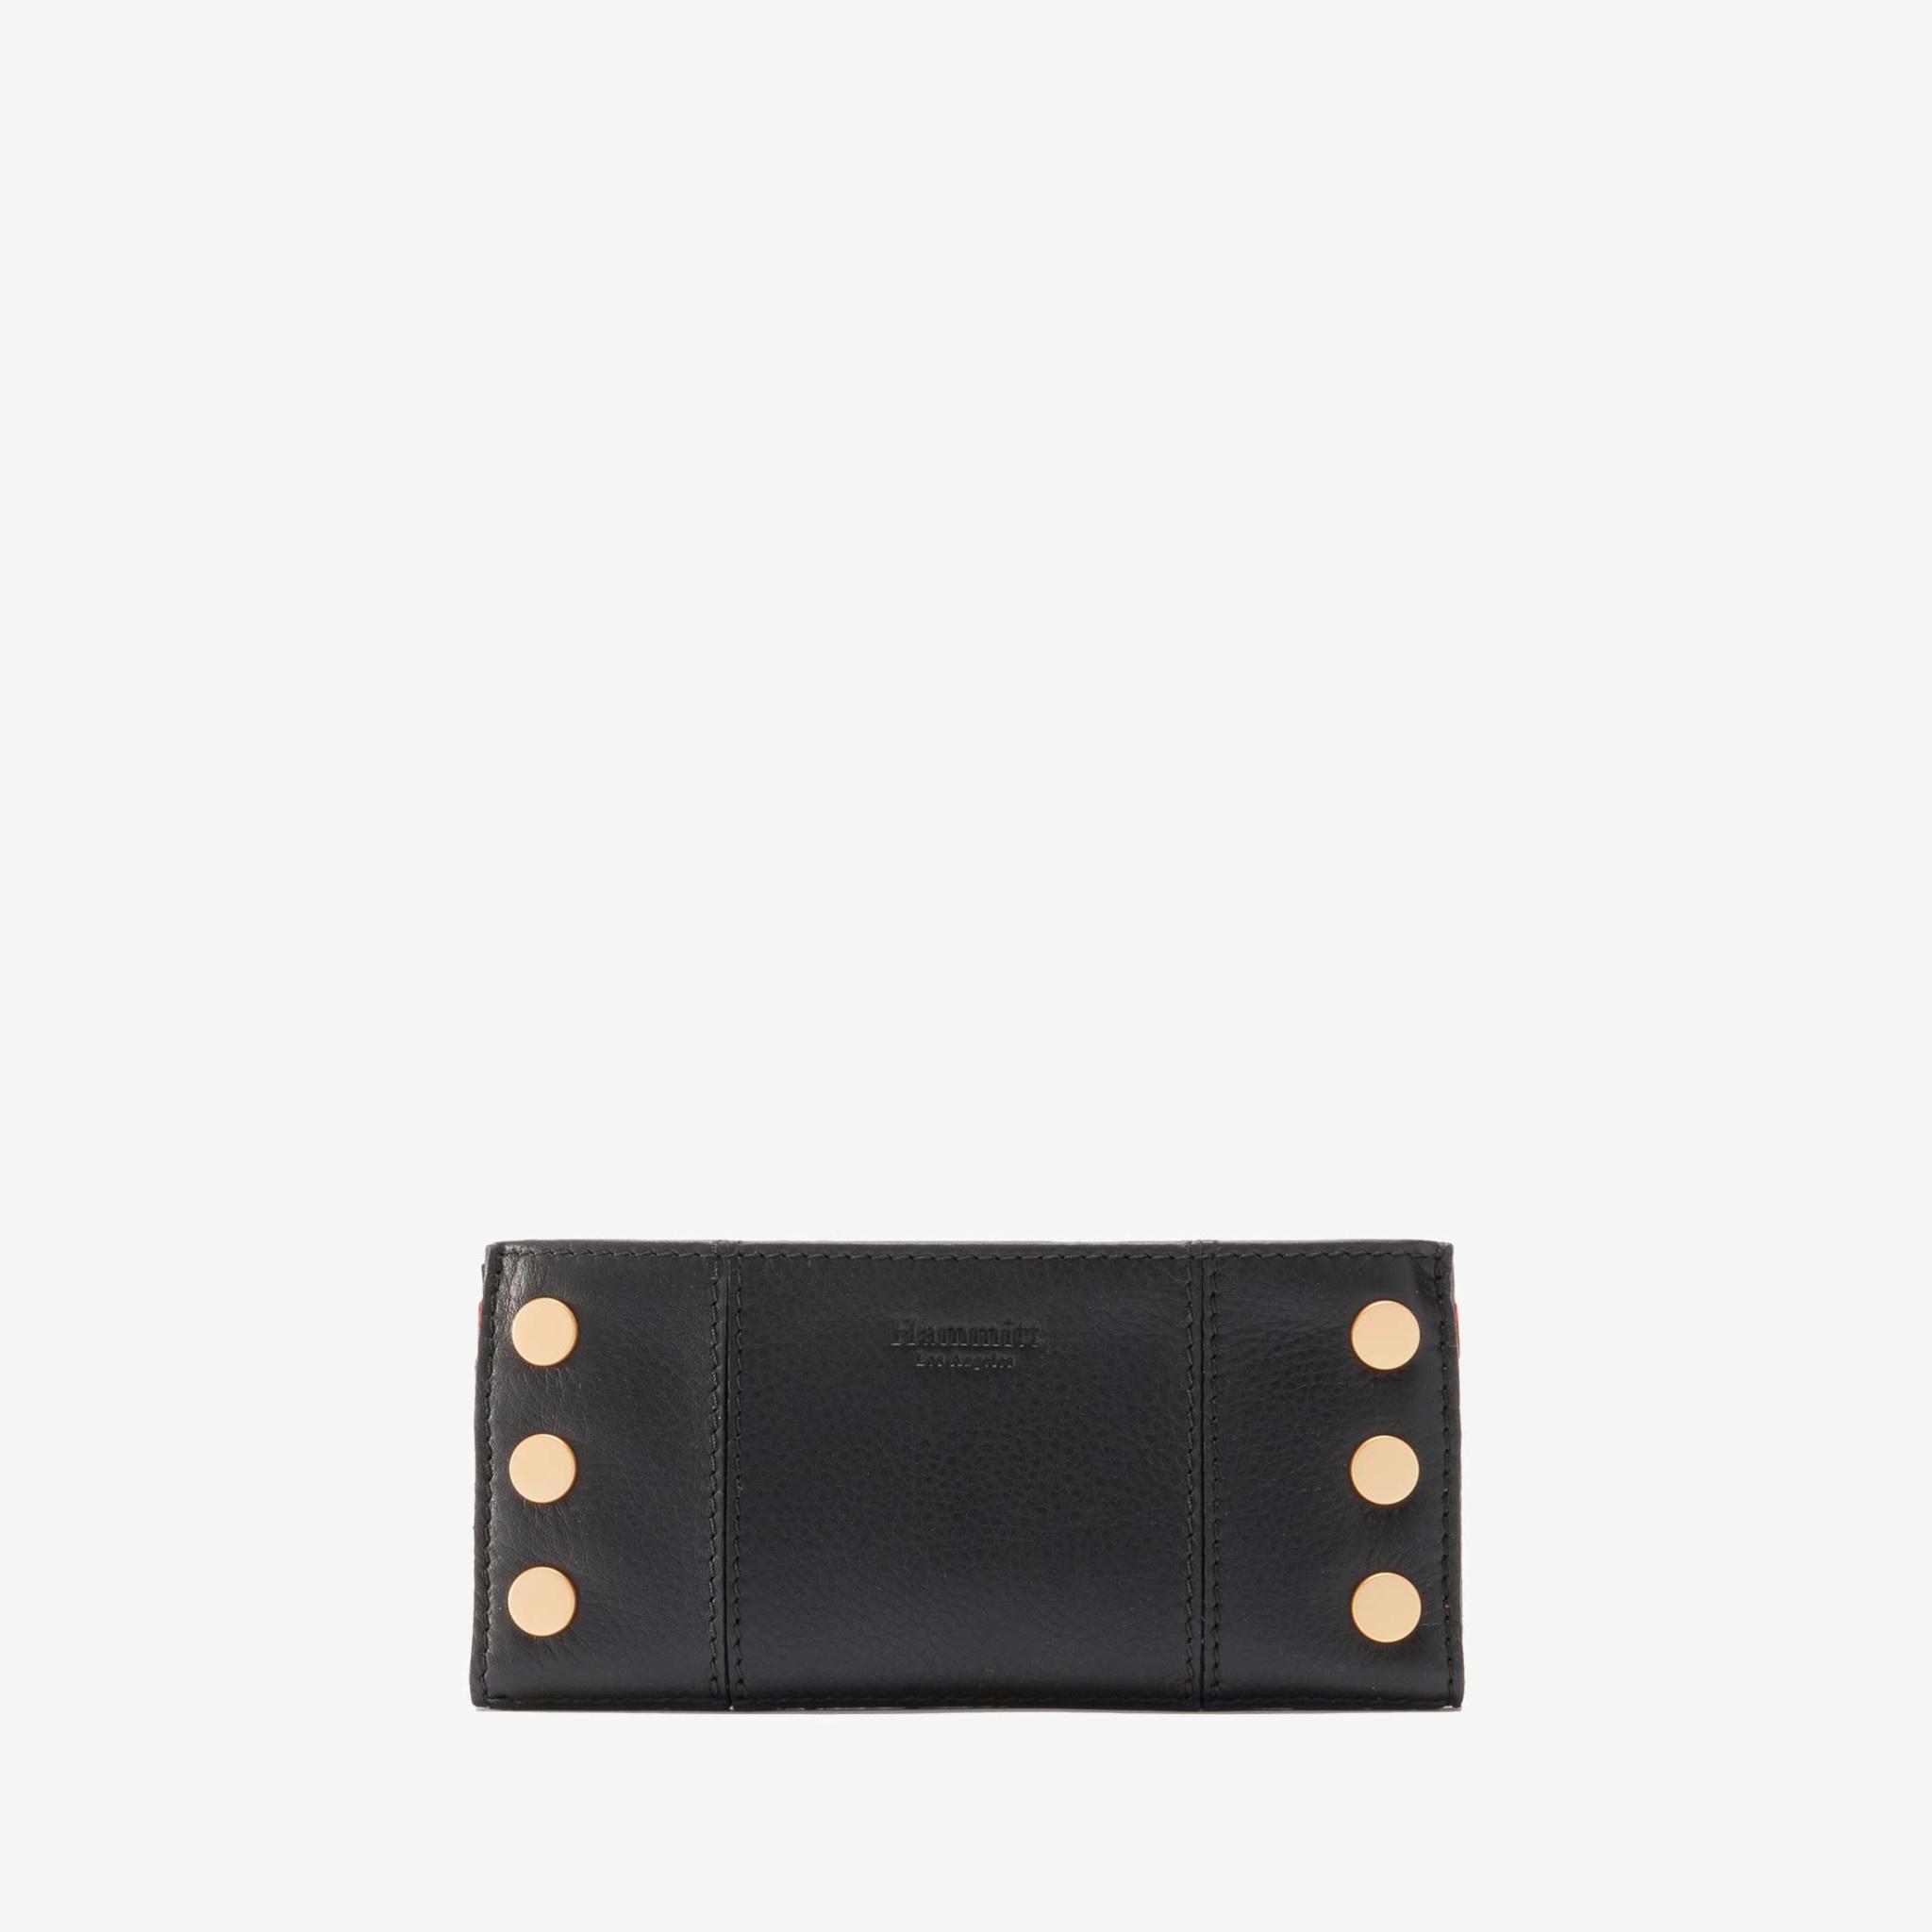 Hammitt 110 North Wallet- Black w Brushed Gold